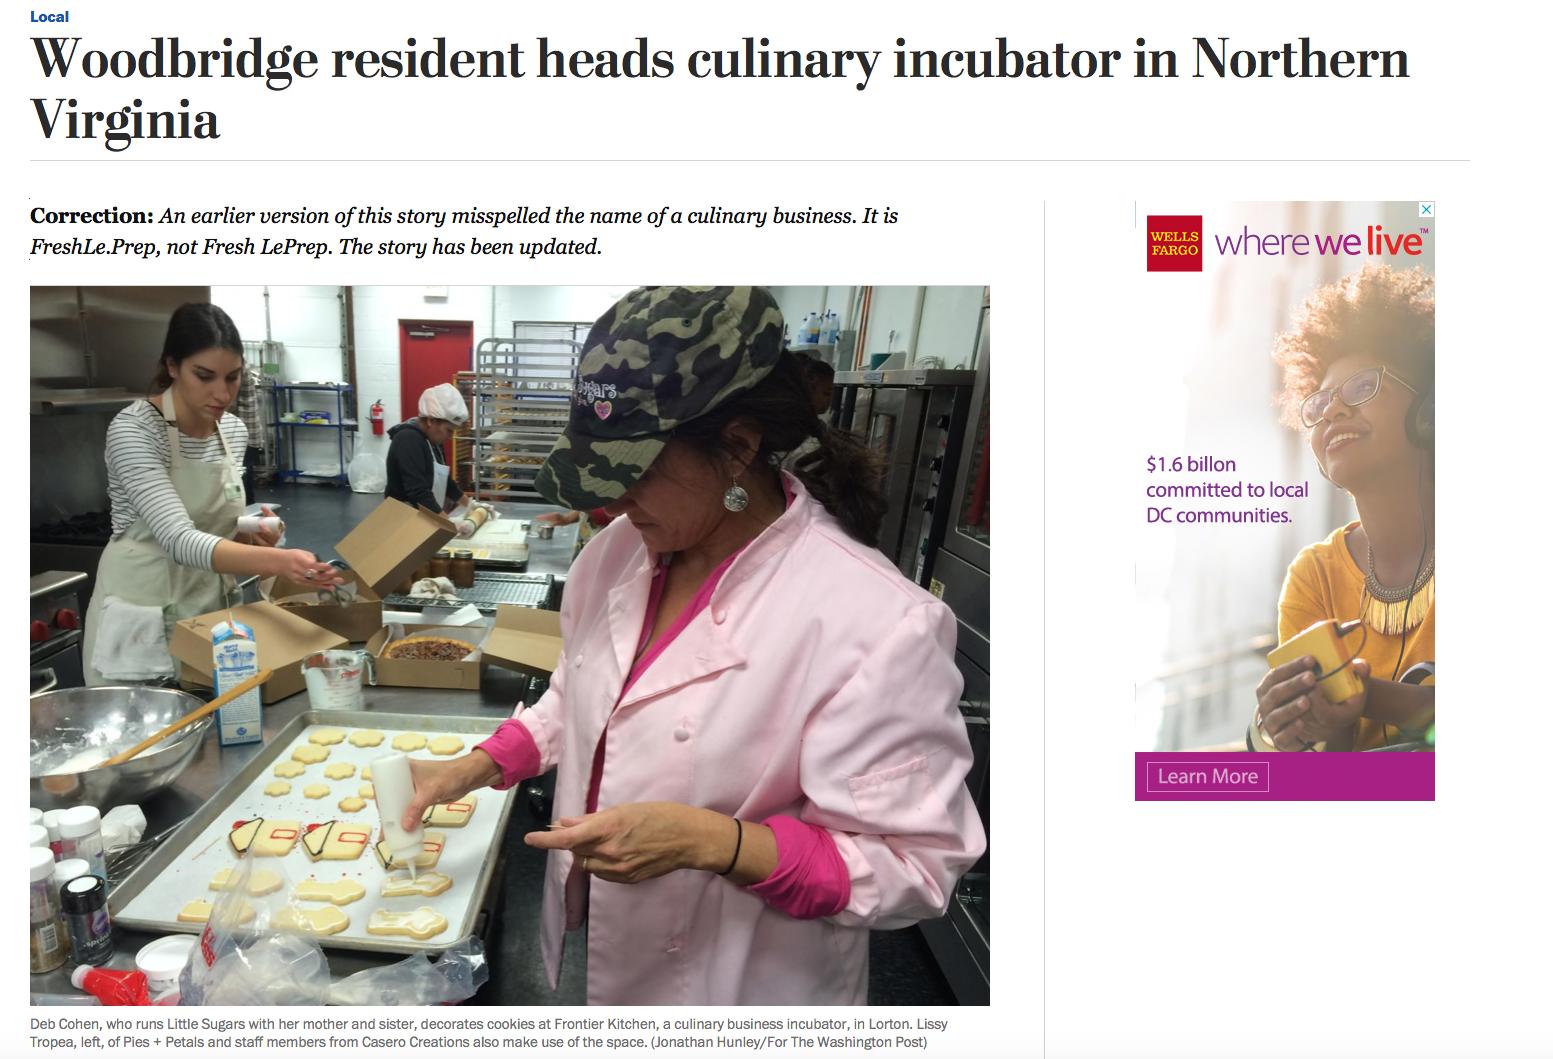 """Woodbridge resident heads culinary incubator in Northern Virginia""    Washington Post 17 January 2016"